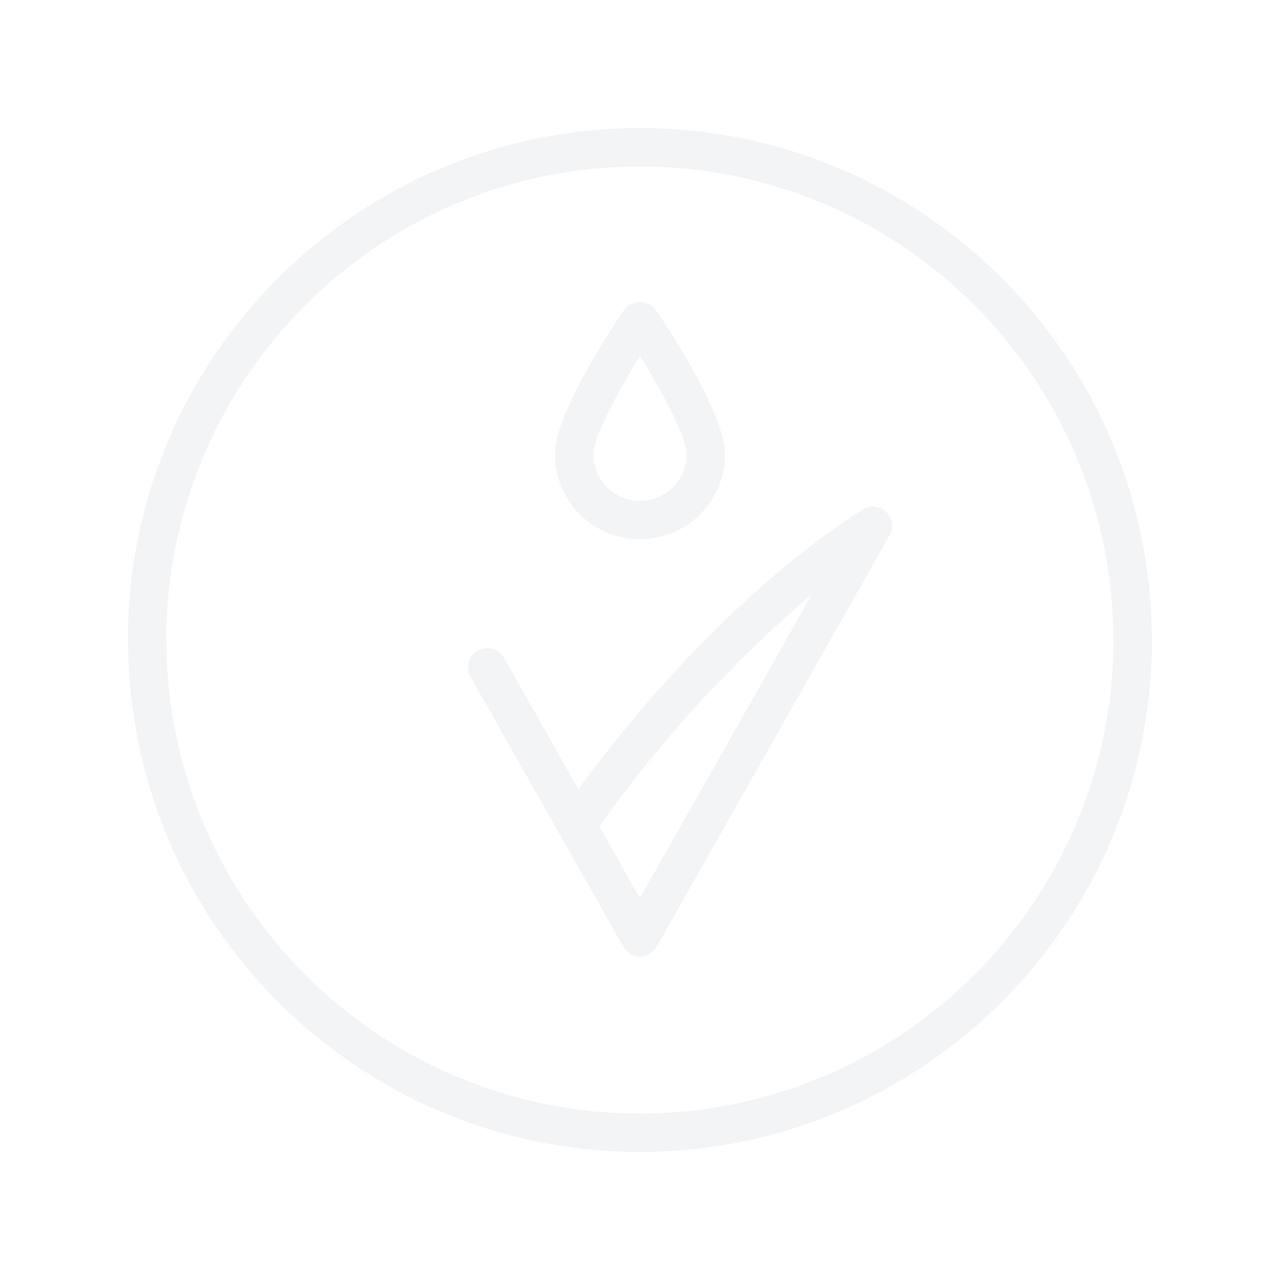 SCHWARZKOPF PROFESSIONAL Blond Me Keratin Restore Bonding Shampoo